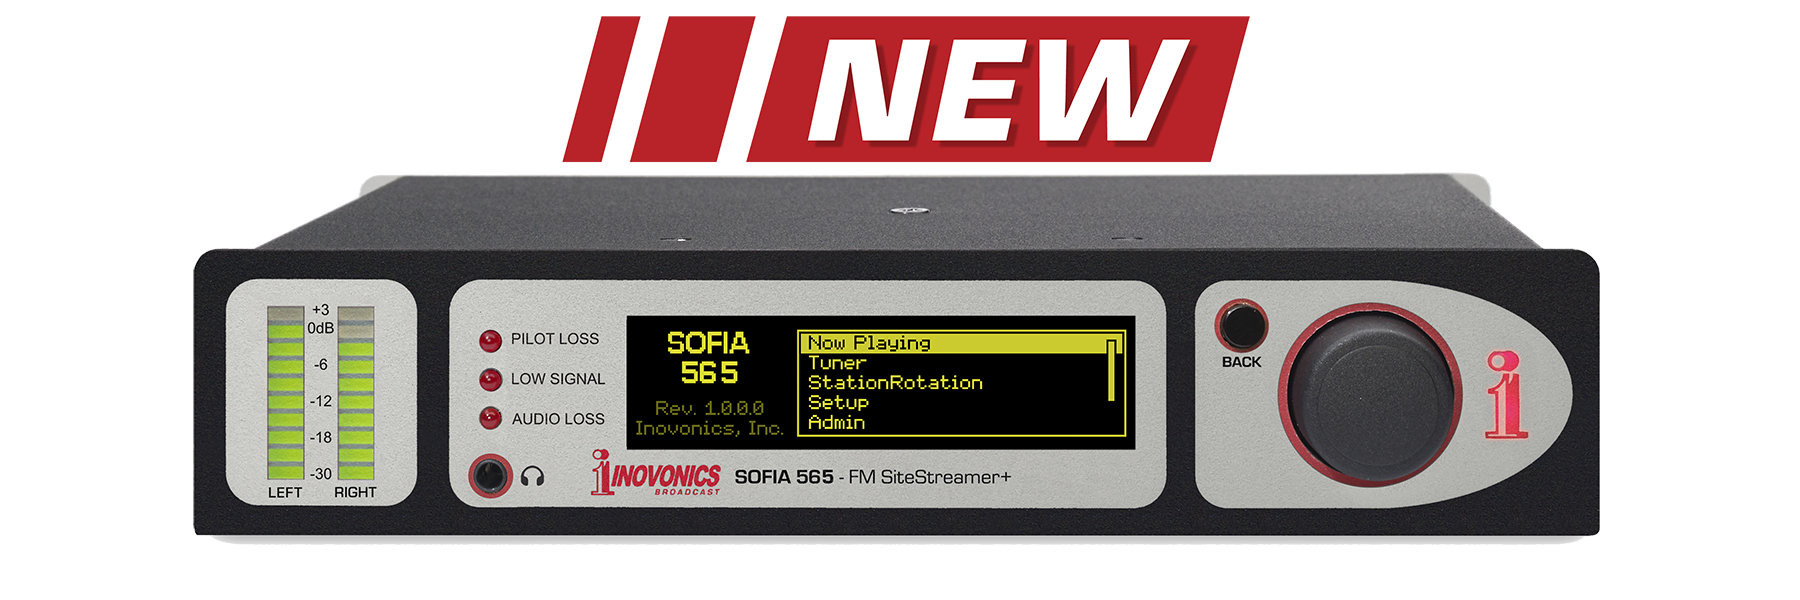 Sofia-565 new